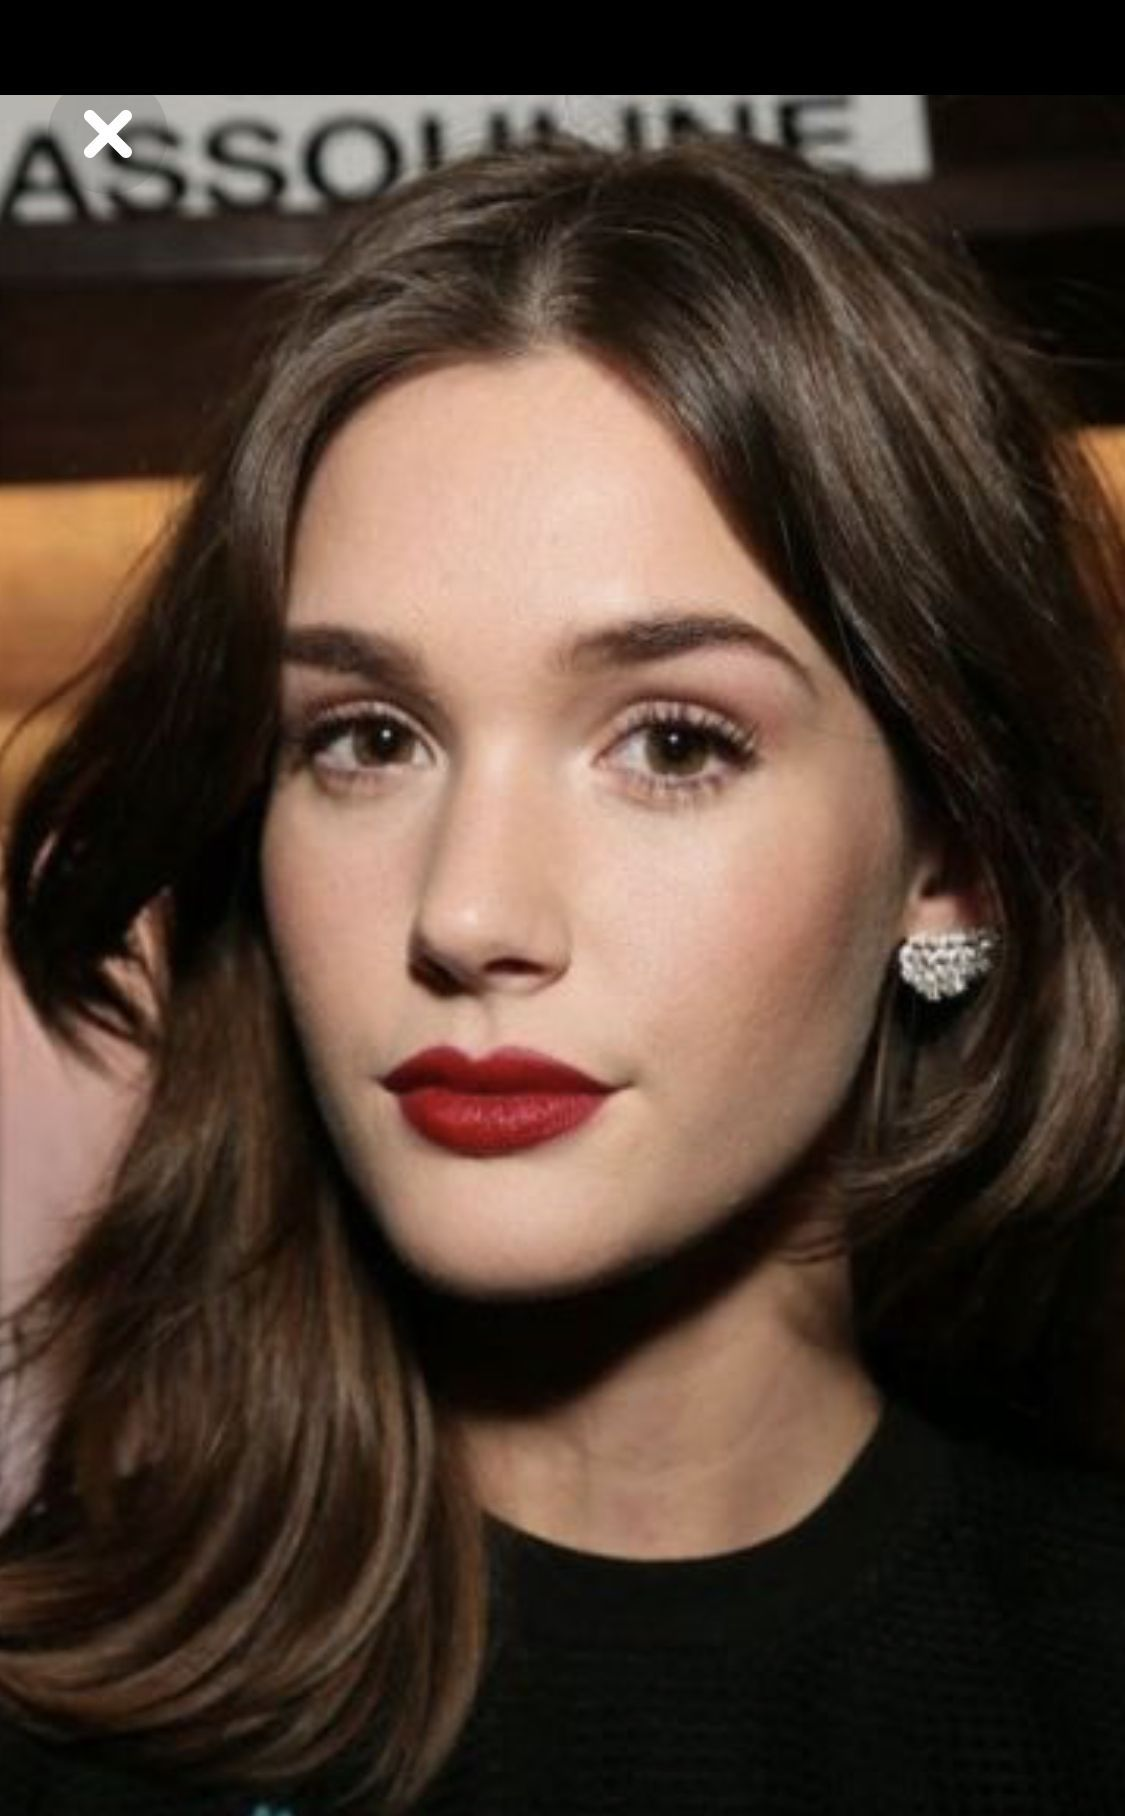 LipstickForFairSkin in 2020 makeup, Red